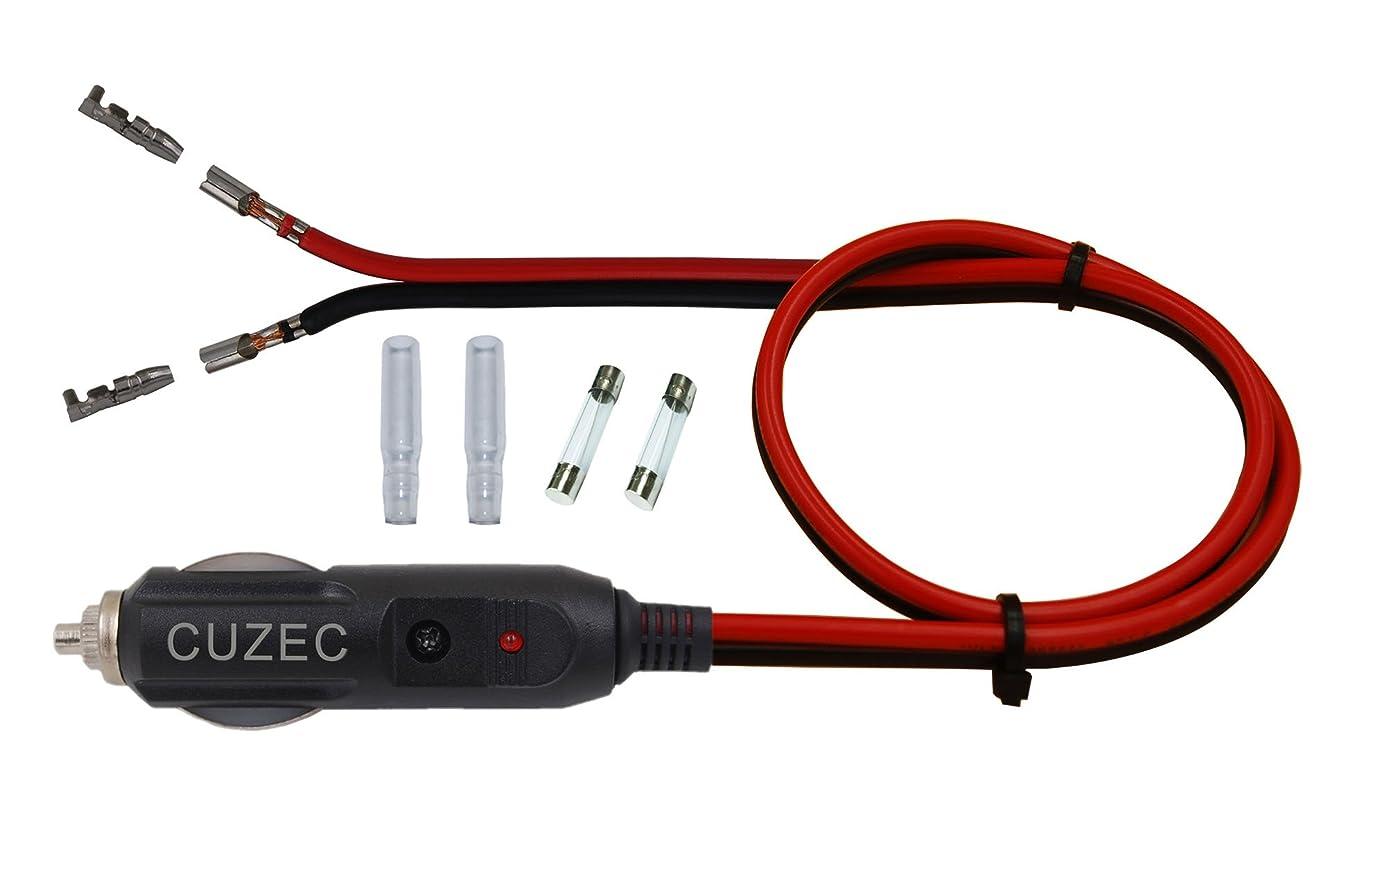 CUZEC 12V Cigarette Lighter Power Adapter ija9032399